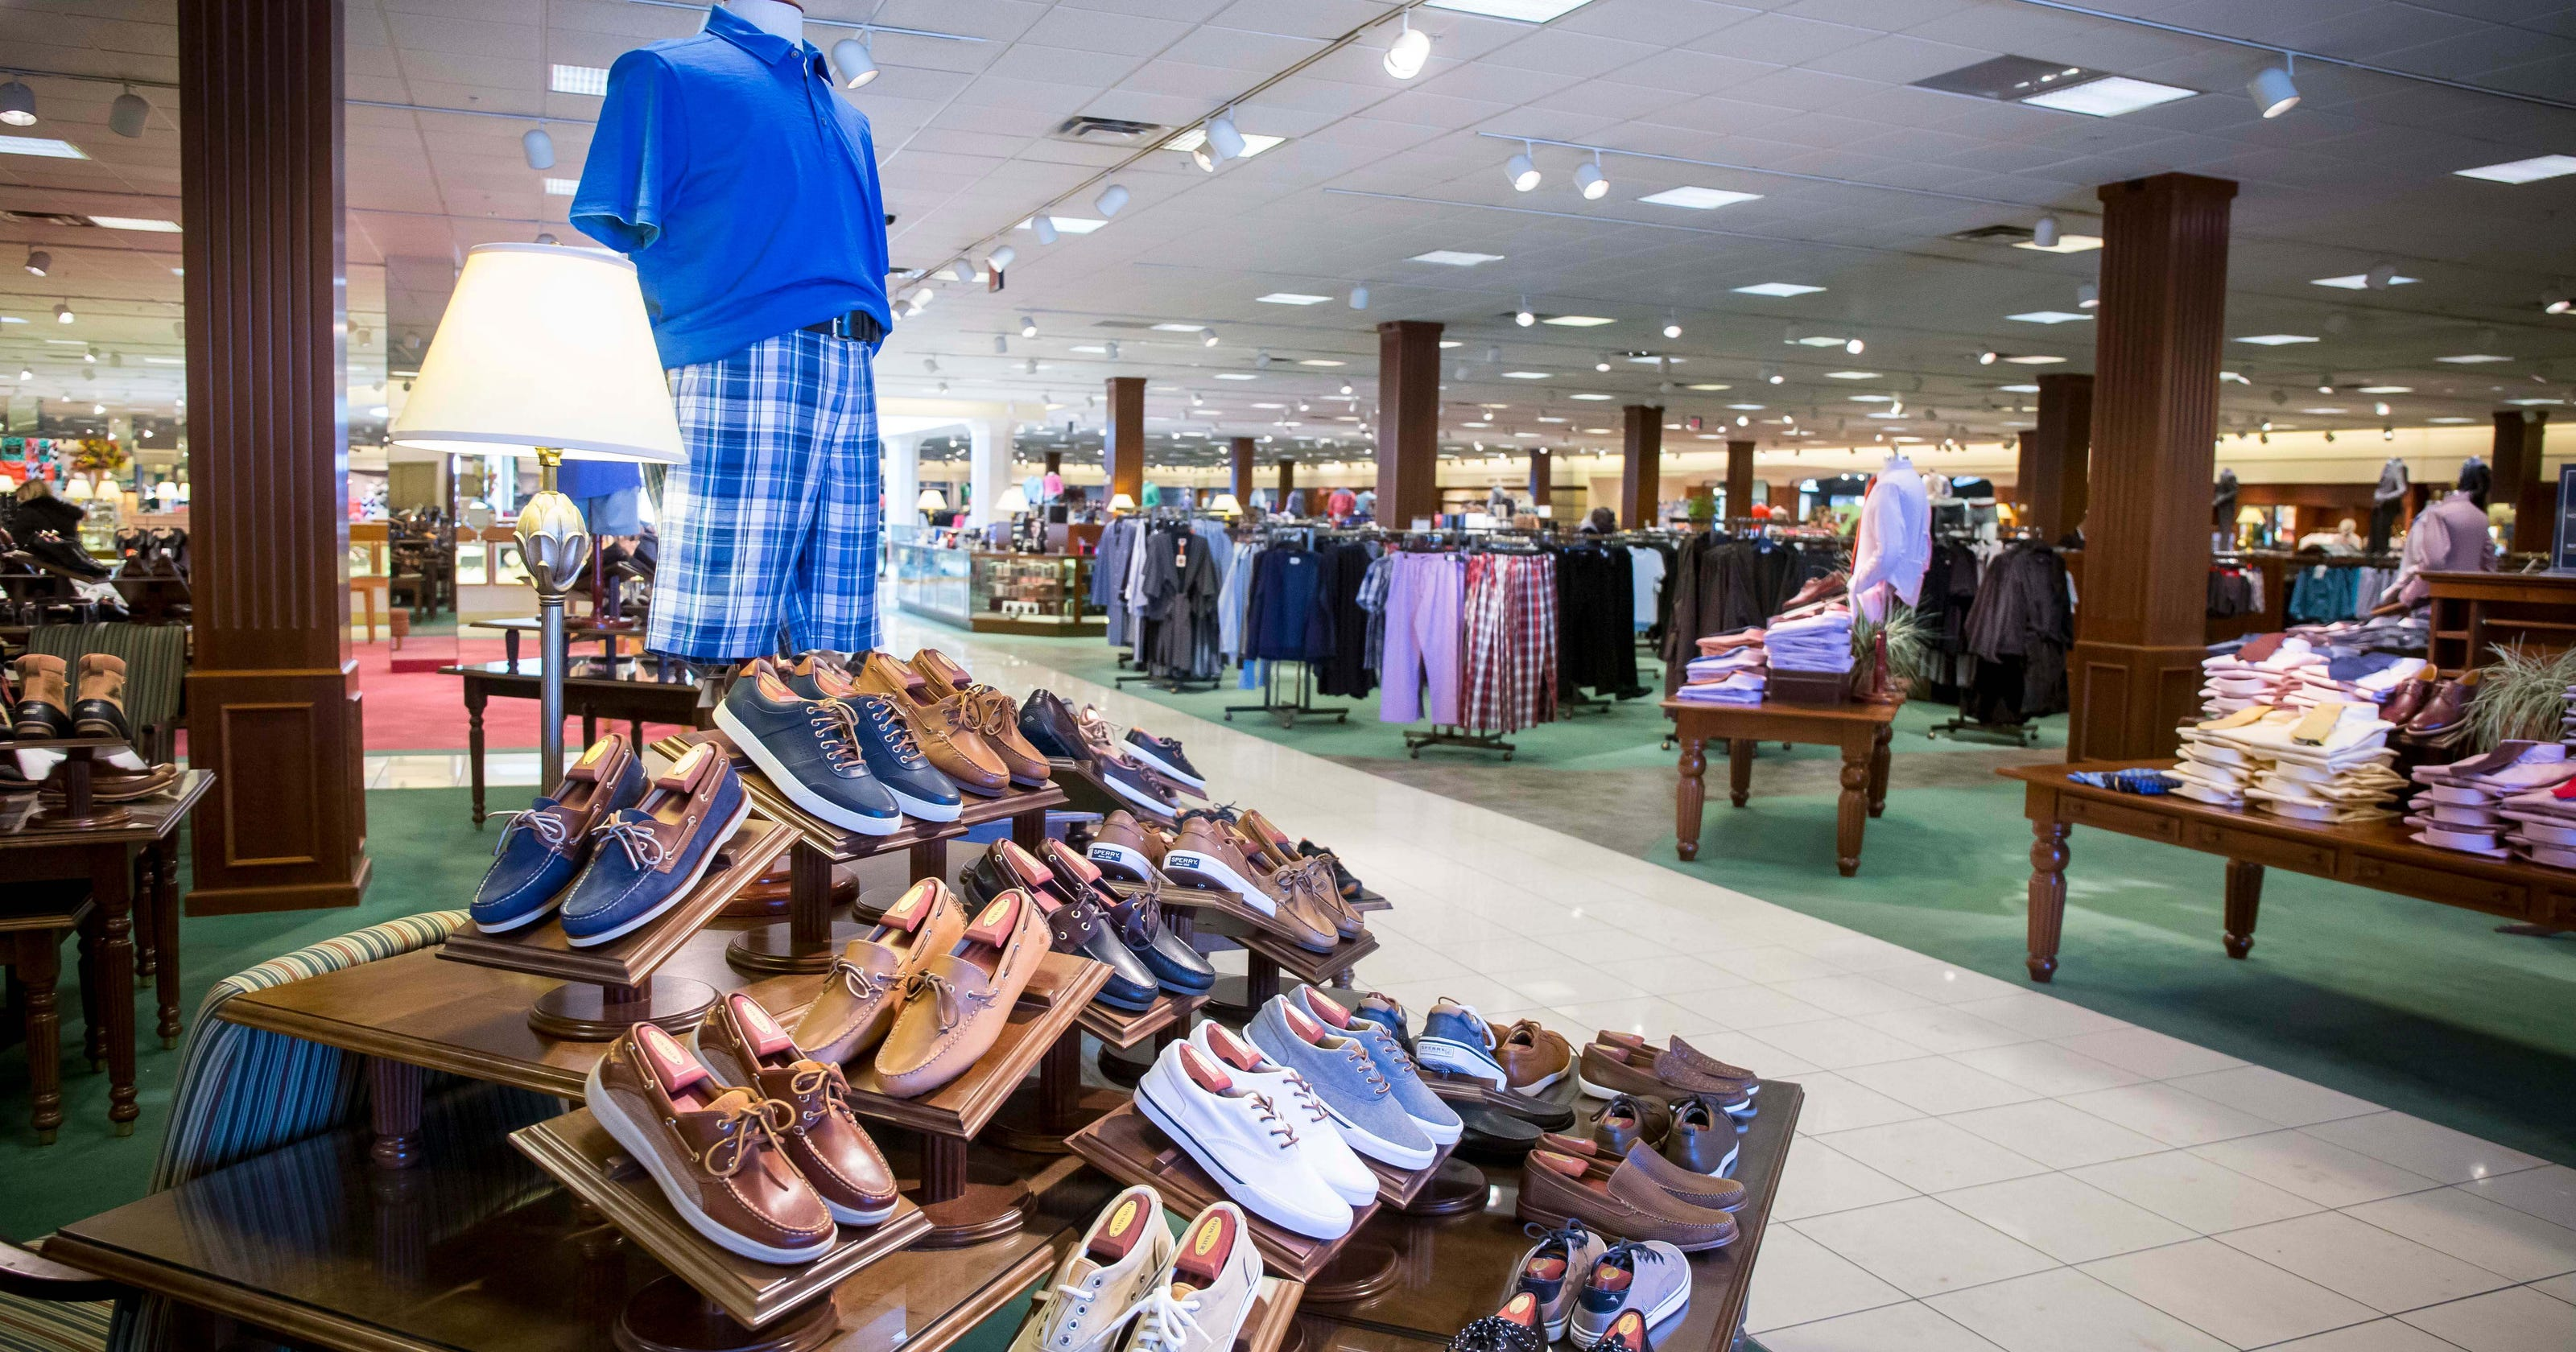 ccac09eb4cb Von Maur bucks retail trend, plans new store at Jordan Creek mall